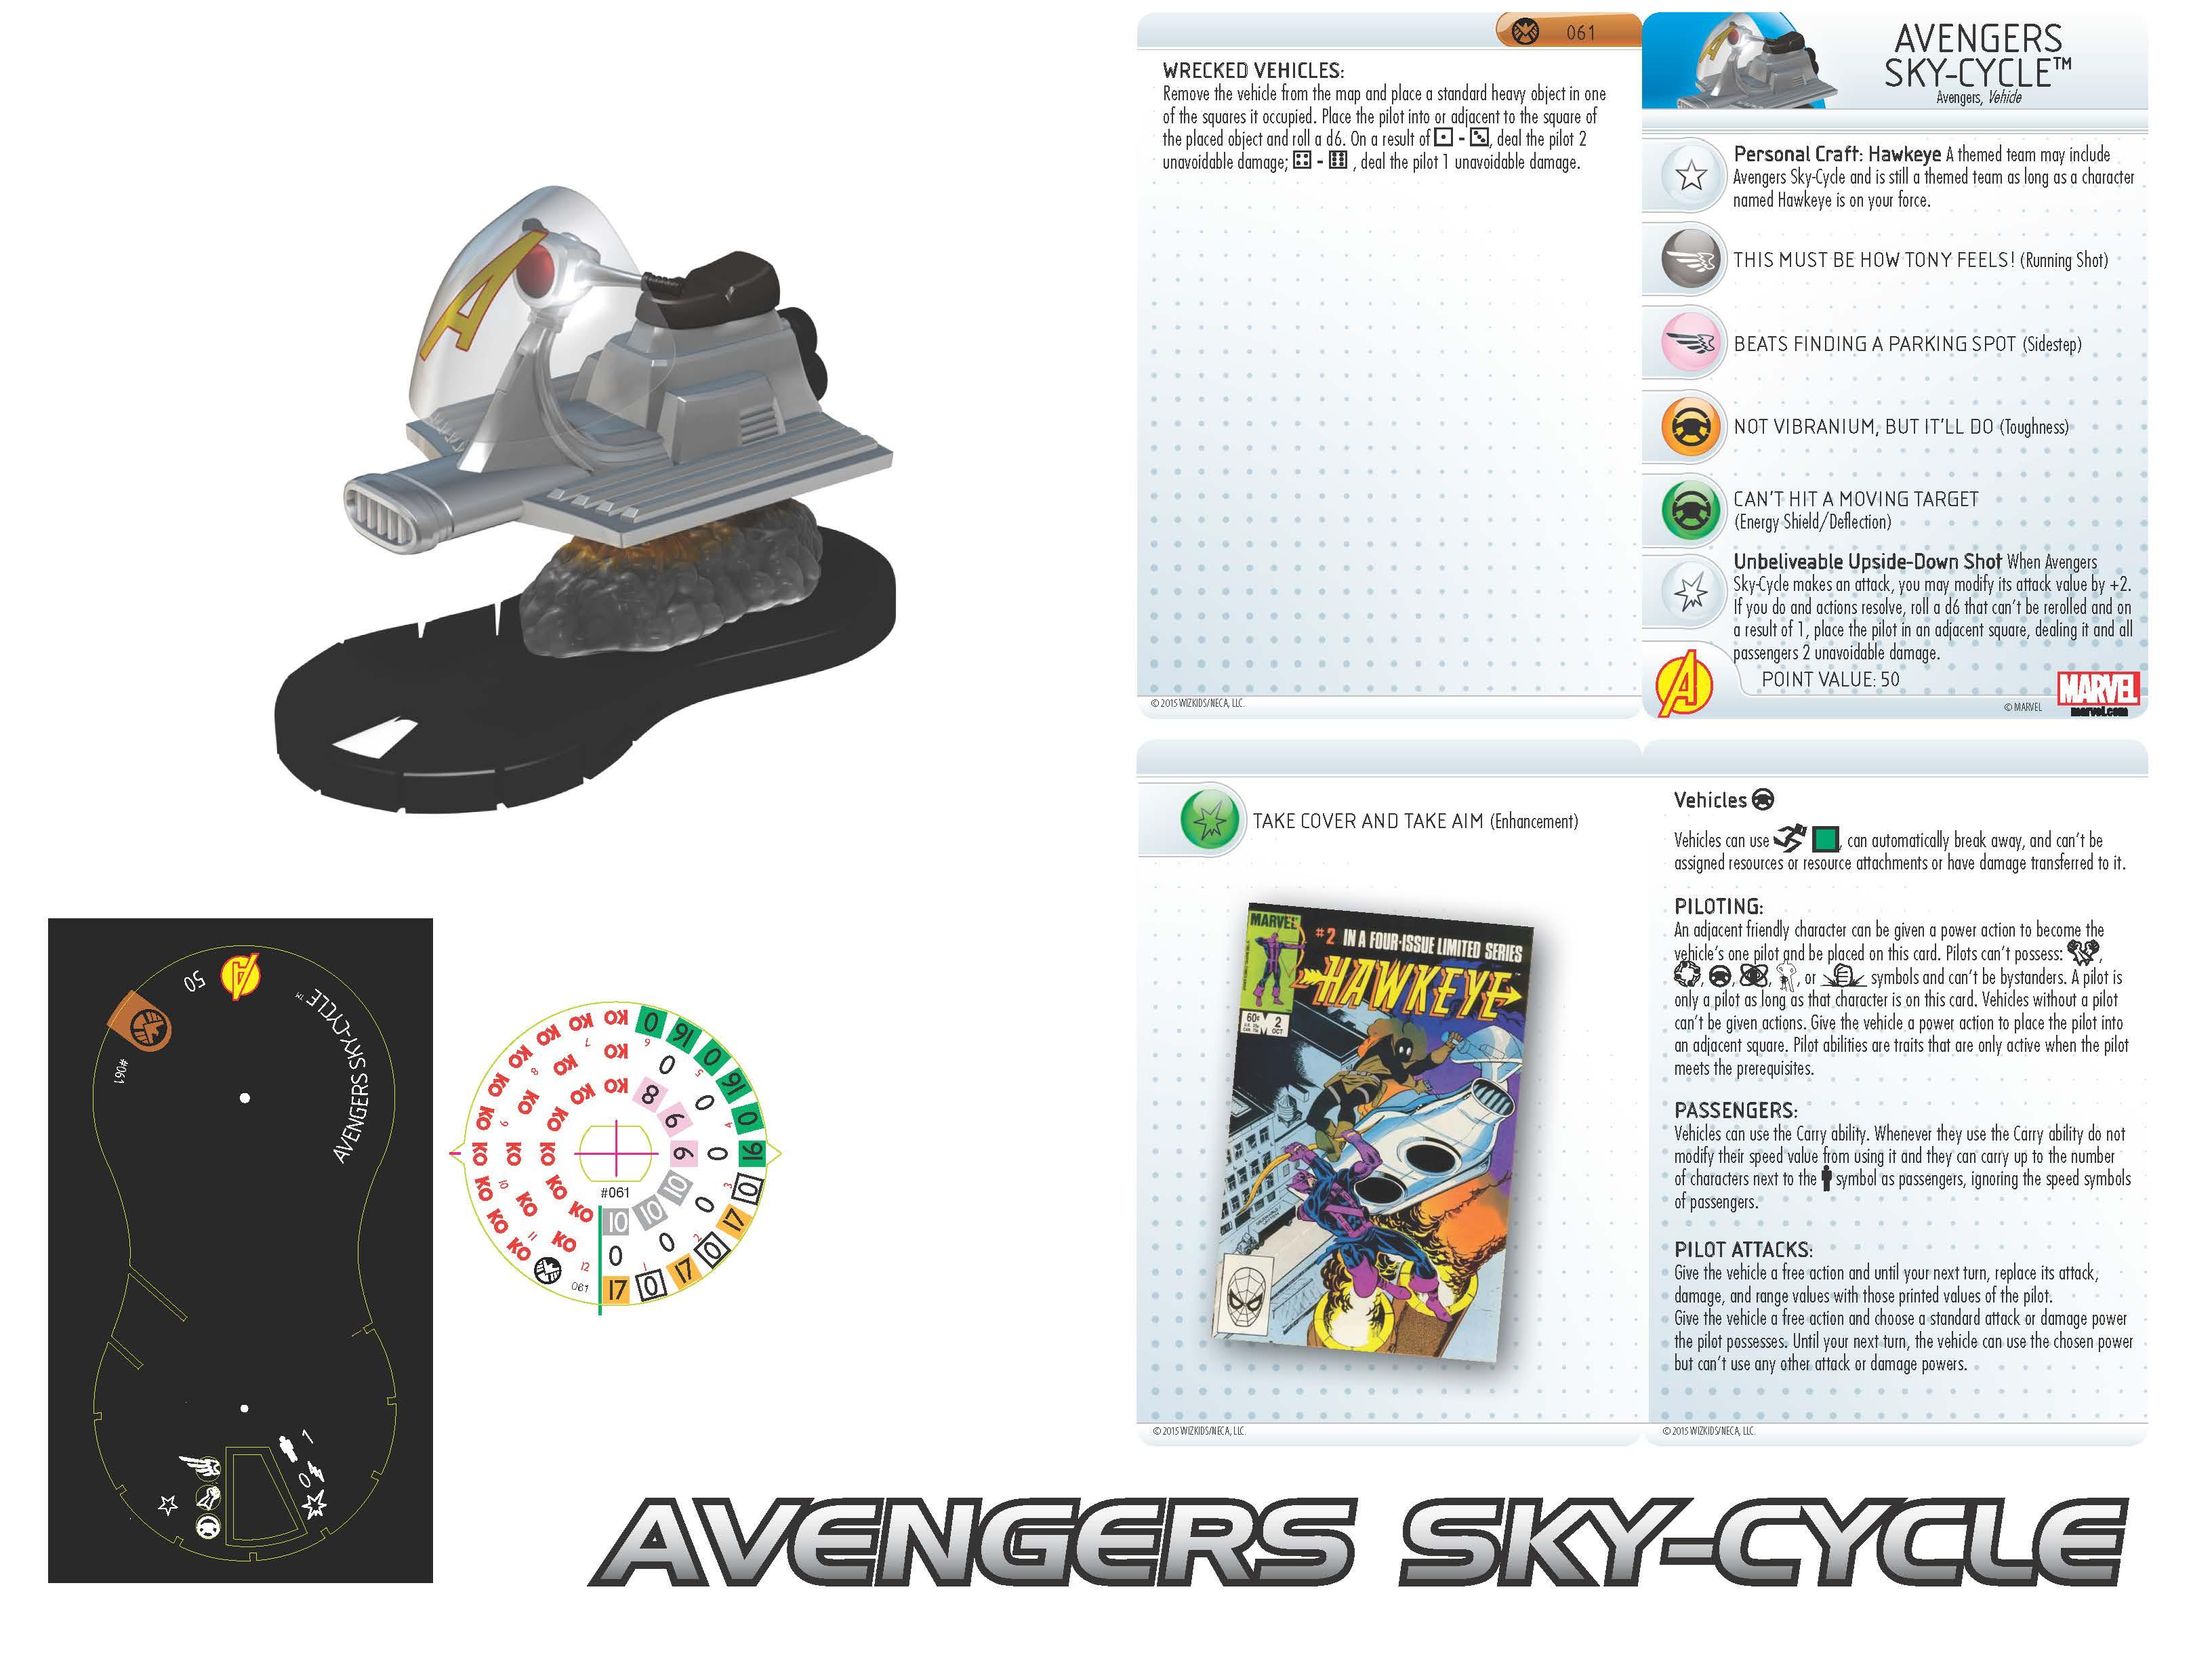 Marvel HeroClix: Nick Fury, Agent of S.H.I.E.L.D. - Avengers Sky-Cycle